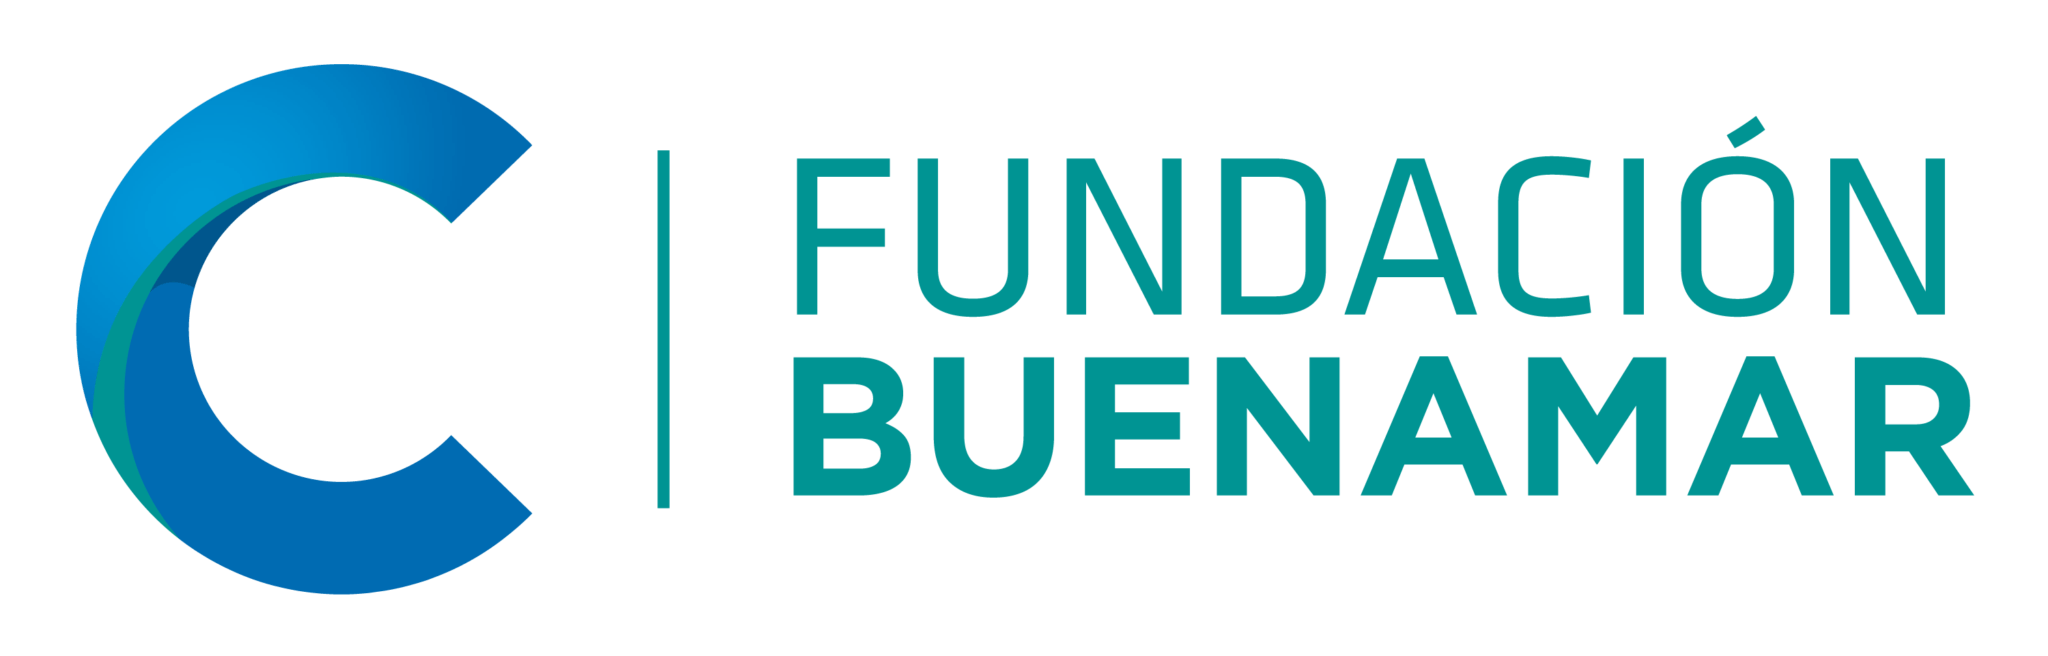 C-Fudación-Buenamar-full-1-2048x656